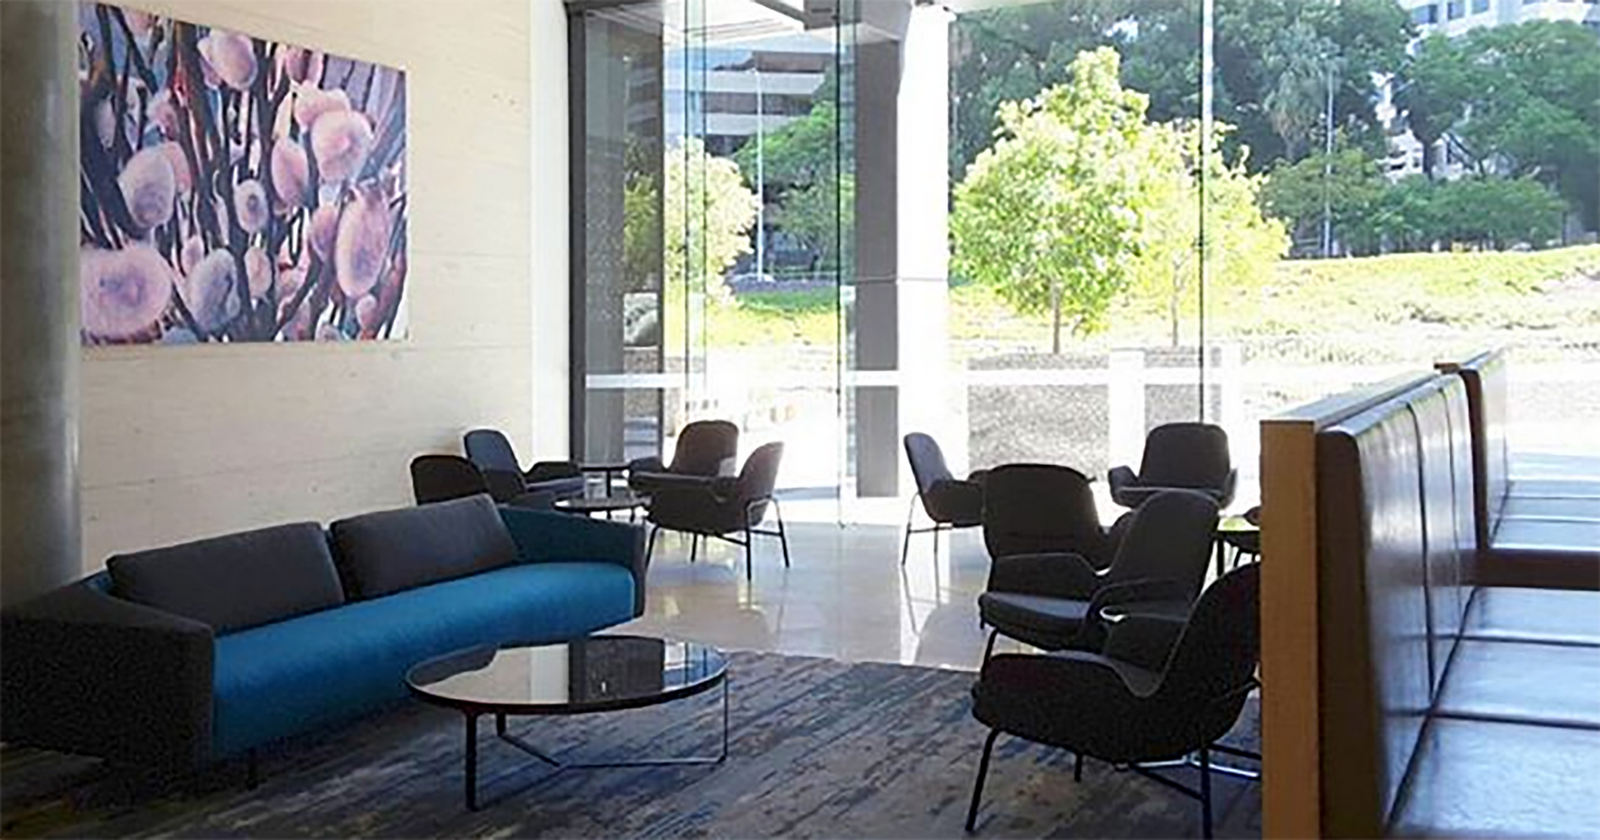 Hawaiian ground floor lobby and cafe refurbishment - Sheet3